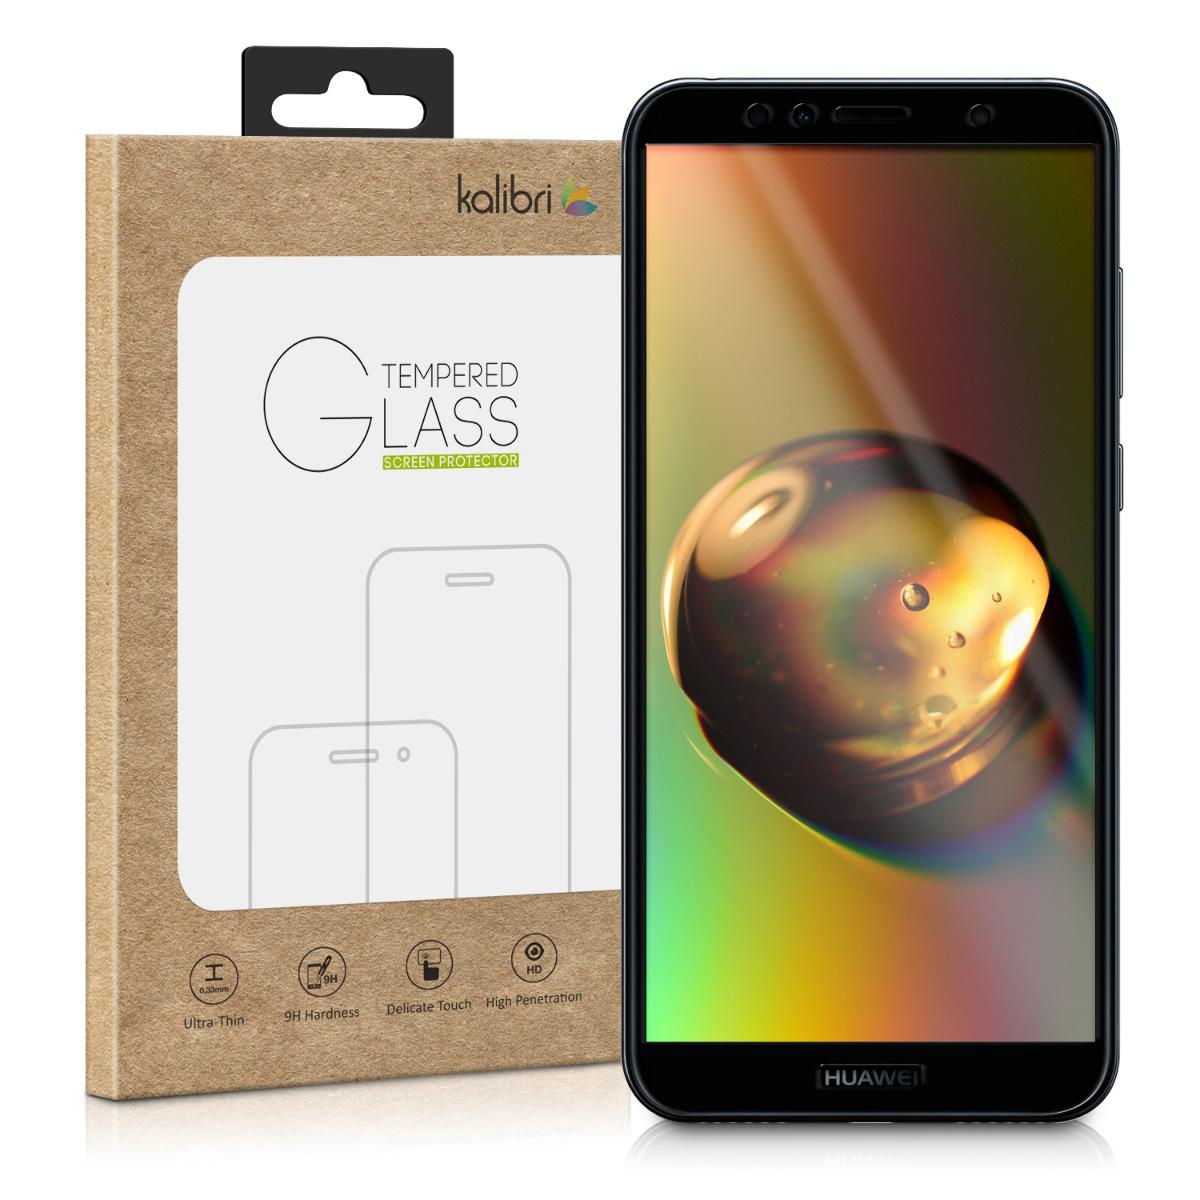 Kalibri Tempered Glass - Fullface Αντιχαρακτικό Γυαλί Οθόνης Huawei Y6 2018 - Black Frame (45991.01)